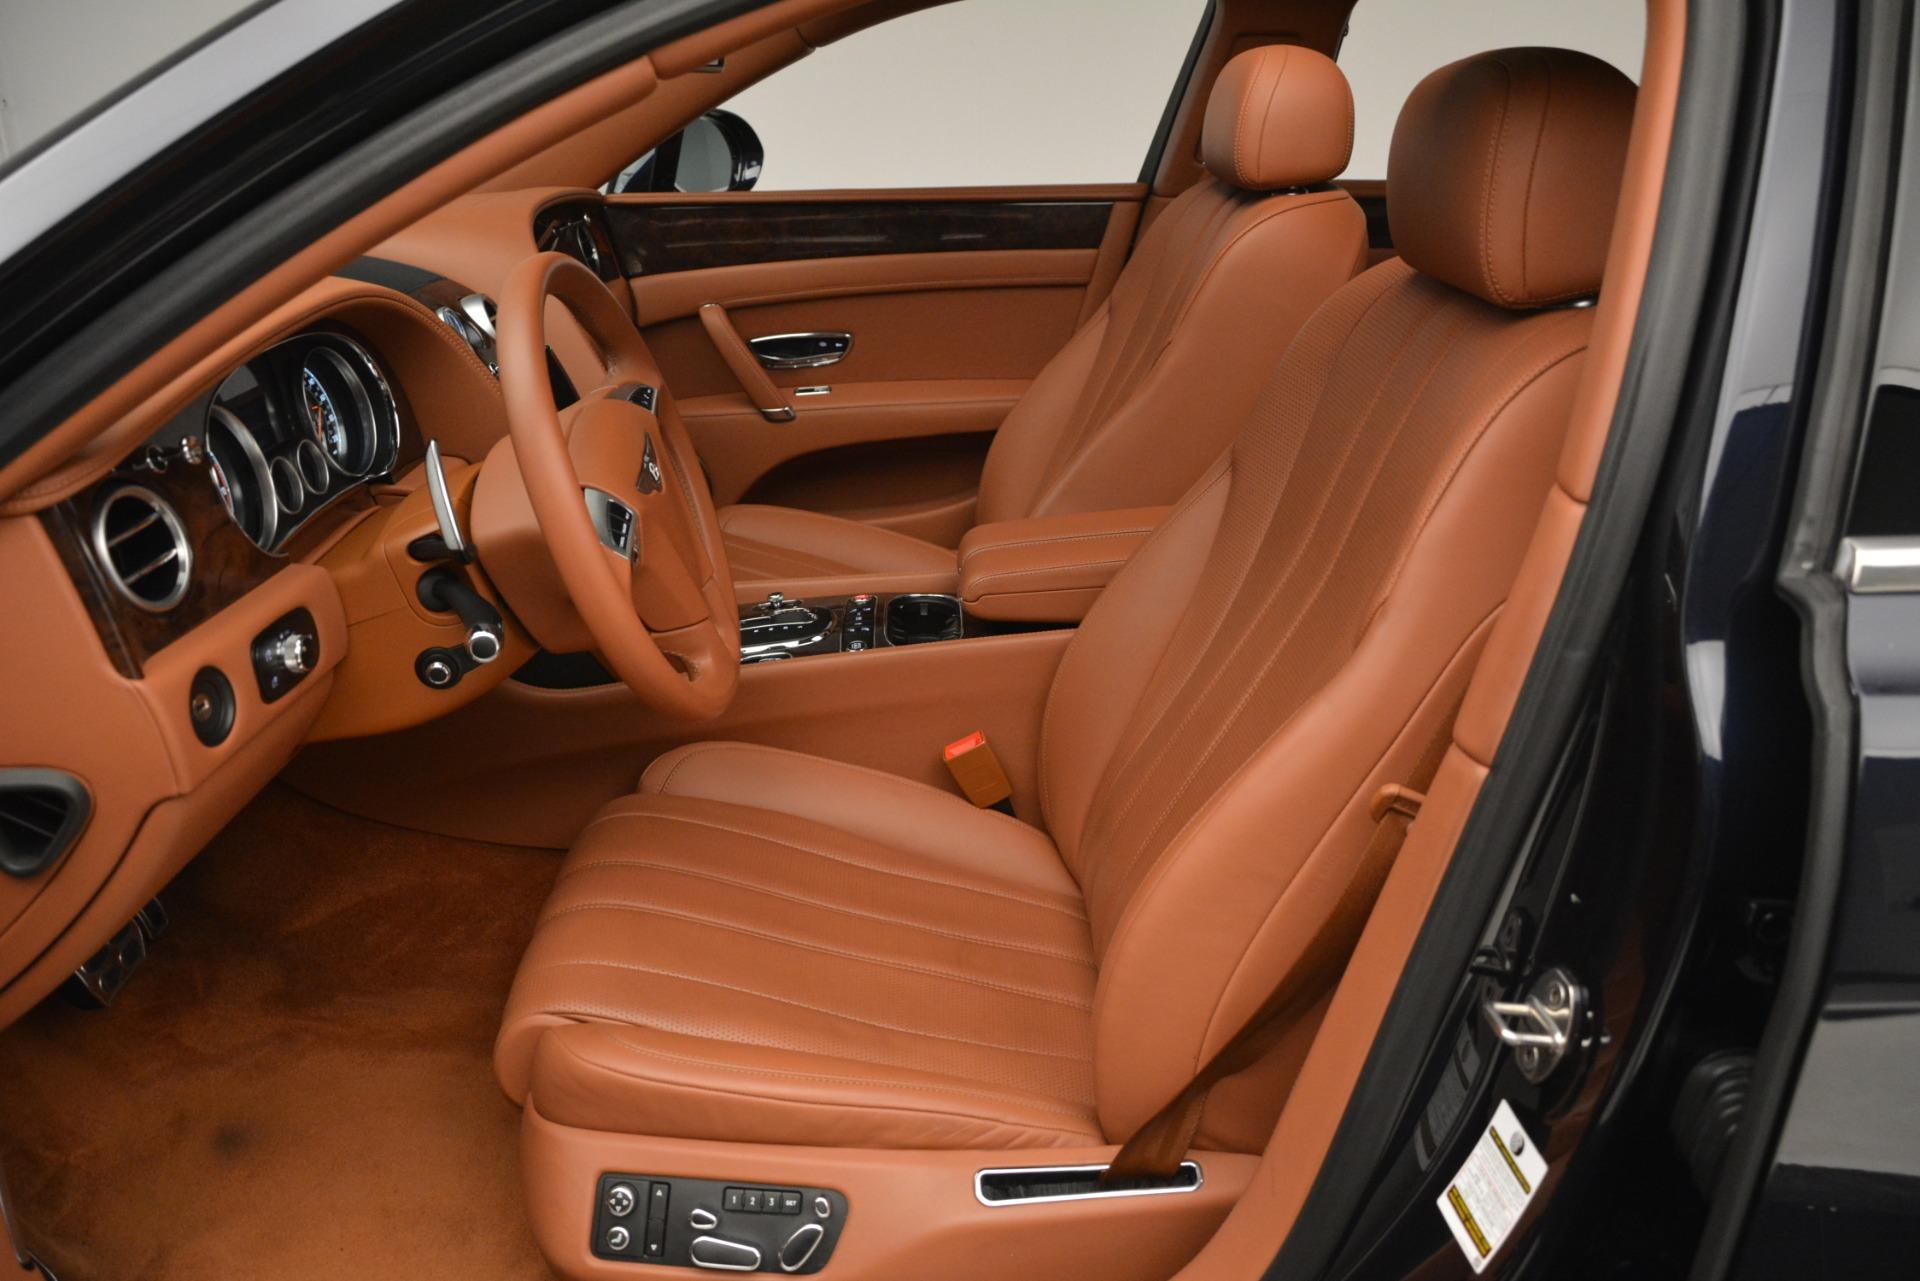 Used 2016 Bentley Flying Spur W12 For Sale In Westport, CT 2943_p16